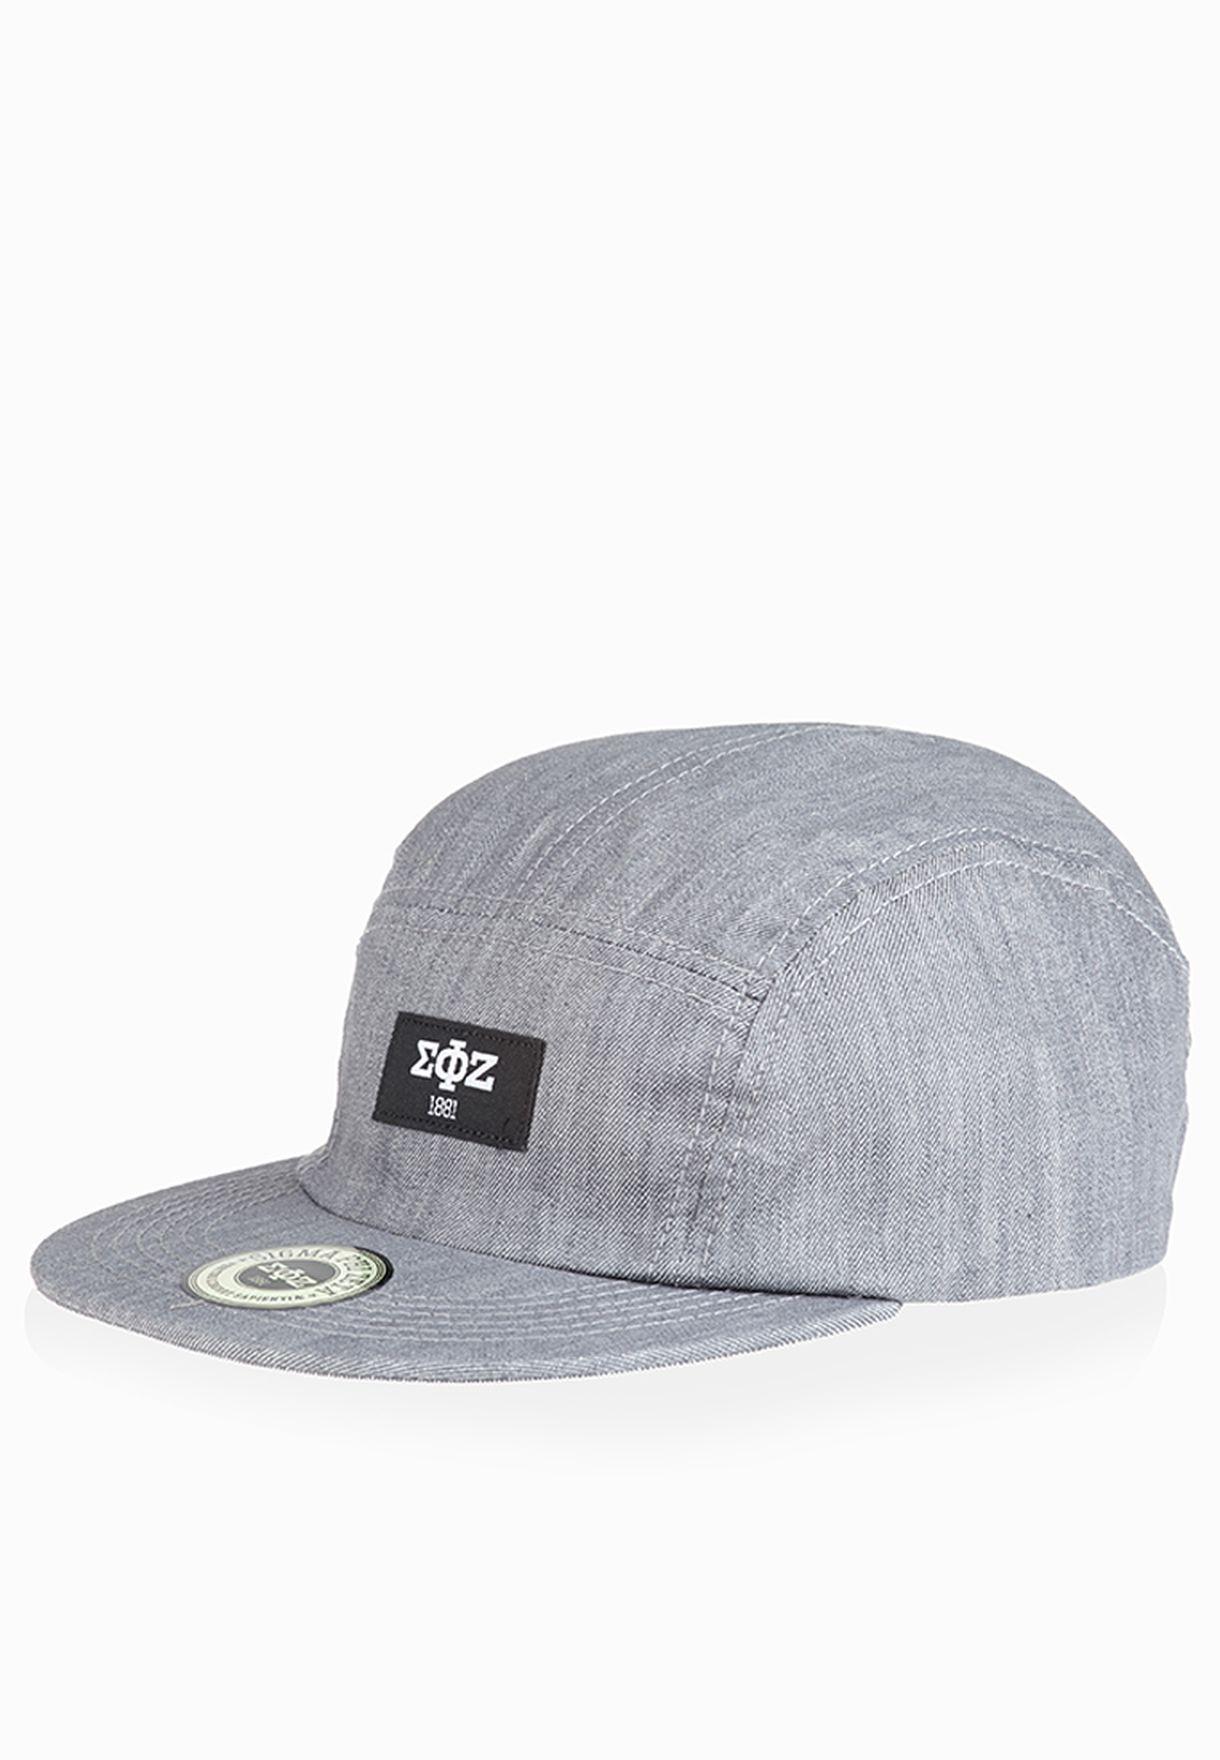 bf75c396cbb Shop Topman grey Fashion Snapback 56J11JGRY for Men in Oman - TO857AC94MMZ